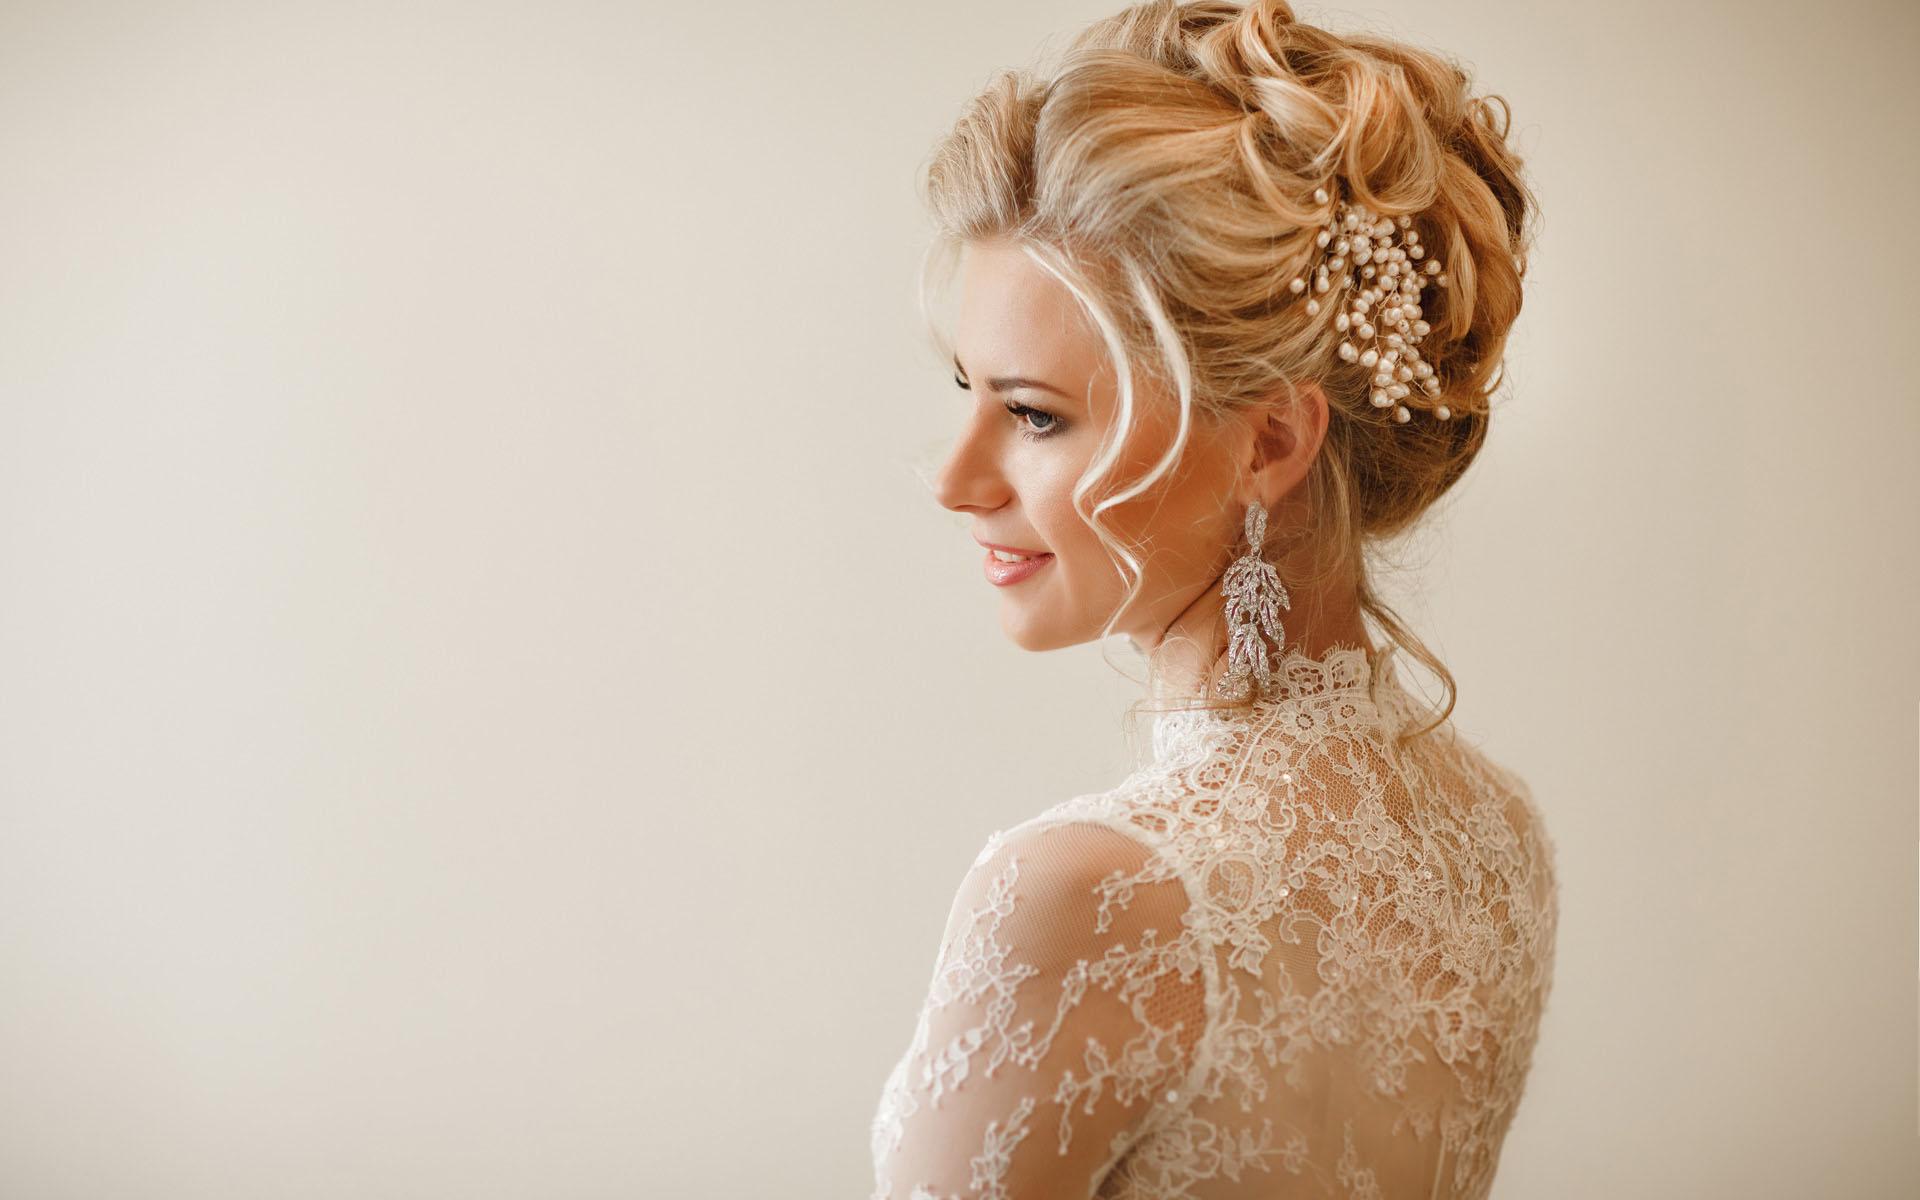 Bridal Hairstyles 2016: Wedding Hairstyles